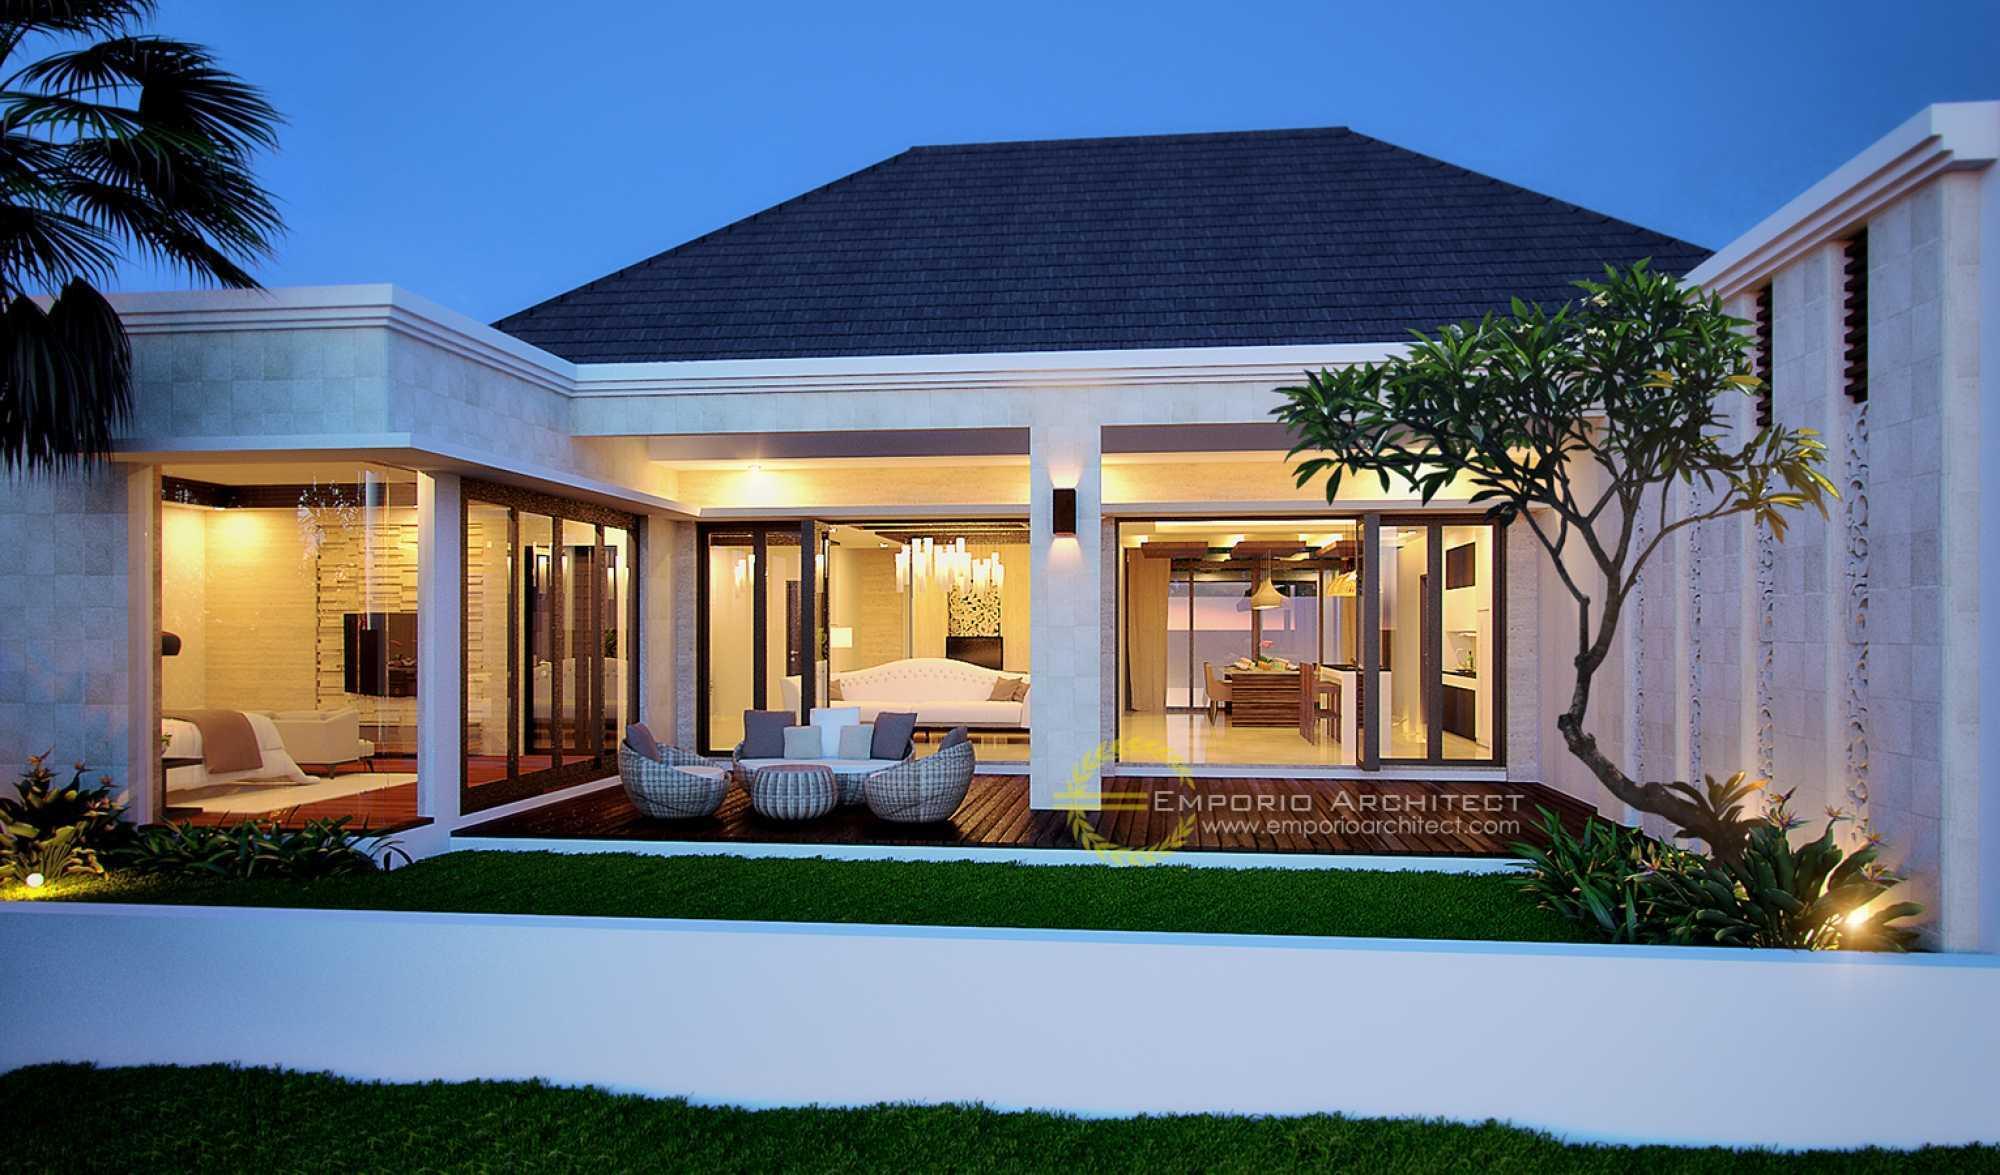 Emporio Architect Desain Rumah Villa Bali Tropis 233 @ Bekasi Bekasi, Kota Bks, Jawa Barat, Indonesia Bekasi, Kota Bks, Jawa Barat, Indonesia Emporio-Architect-Desain-Rumah-Villa-Bali-Tropis-233-Bekasi  73041